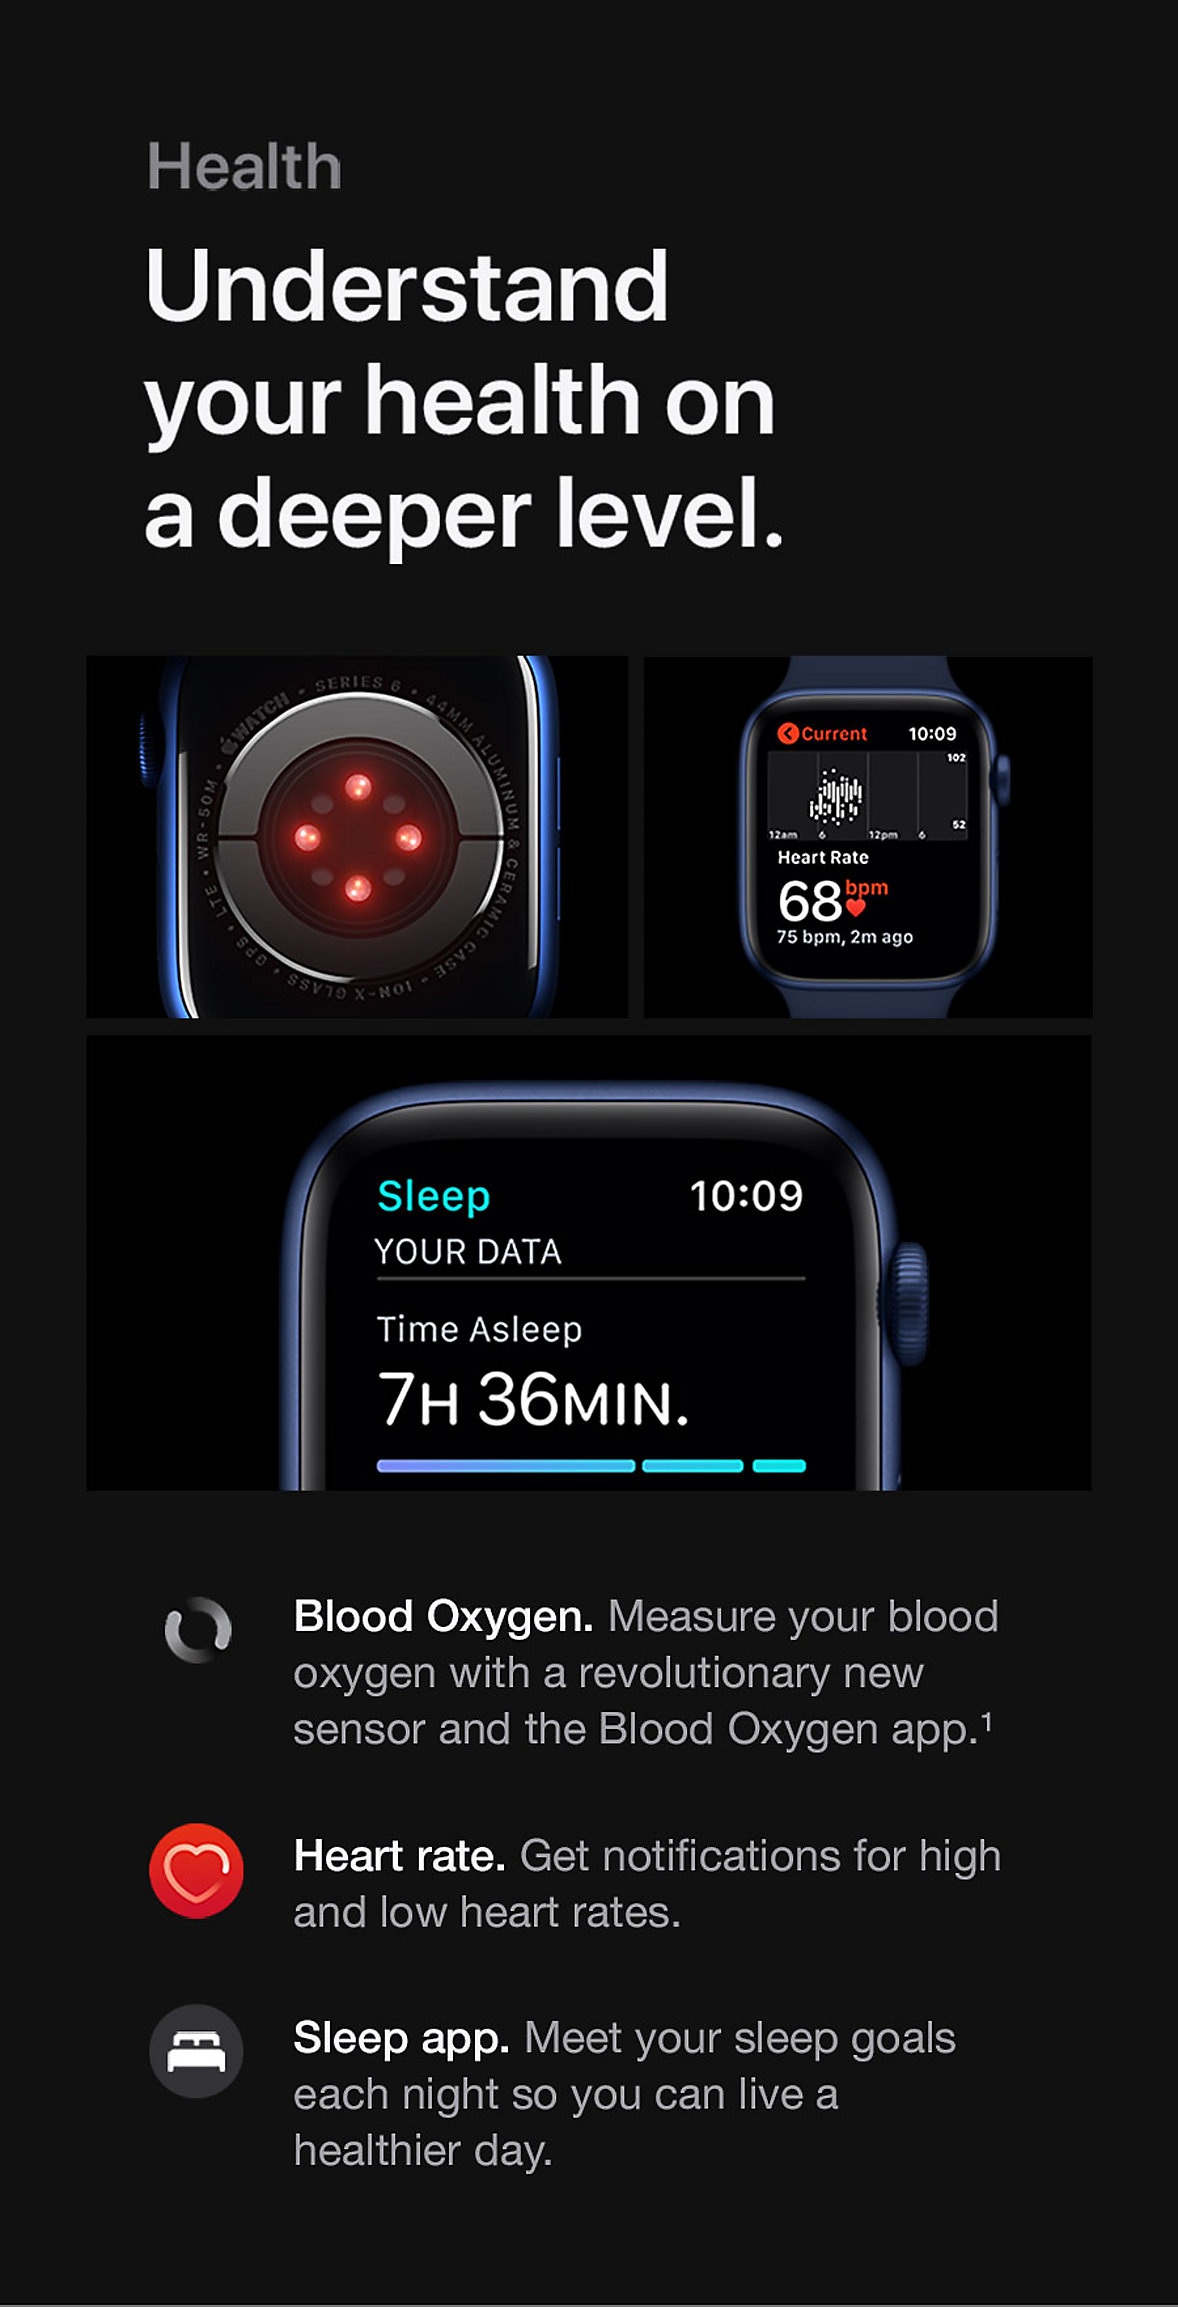 Apple Watch Series 6 Health